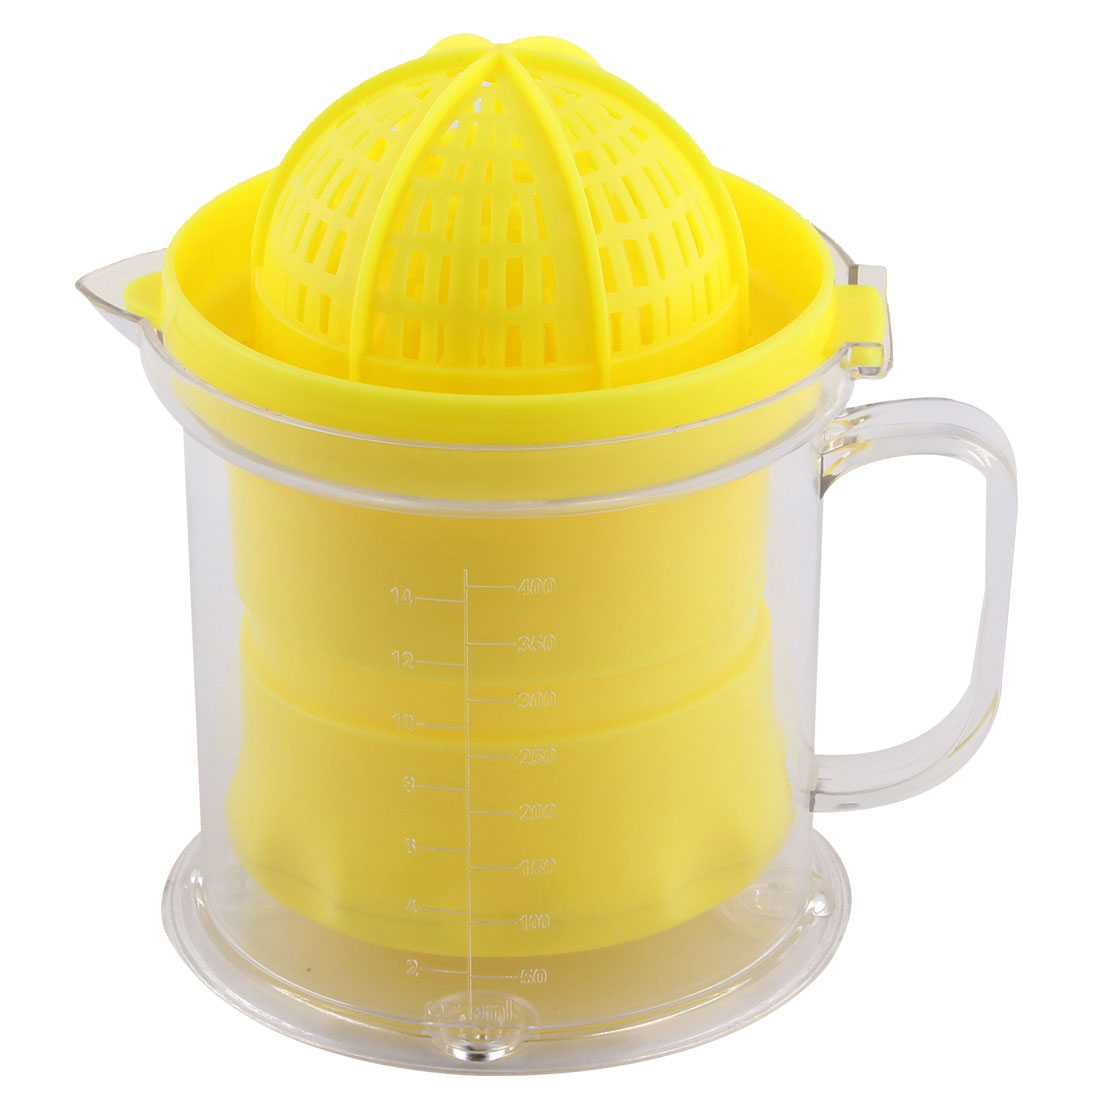 Household Multipurpose Plastic Dome Lid Manual Citrus Juicer 400ml Capacity